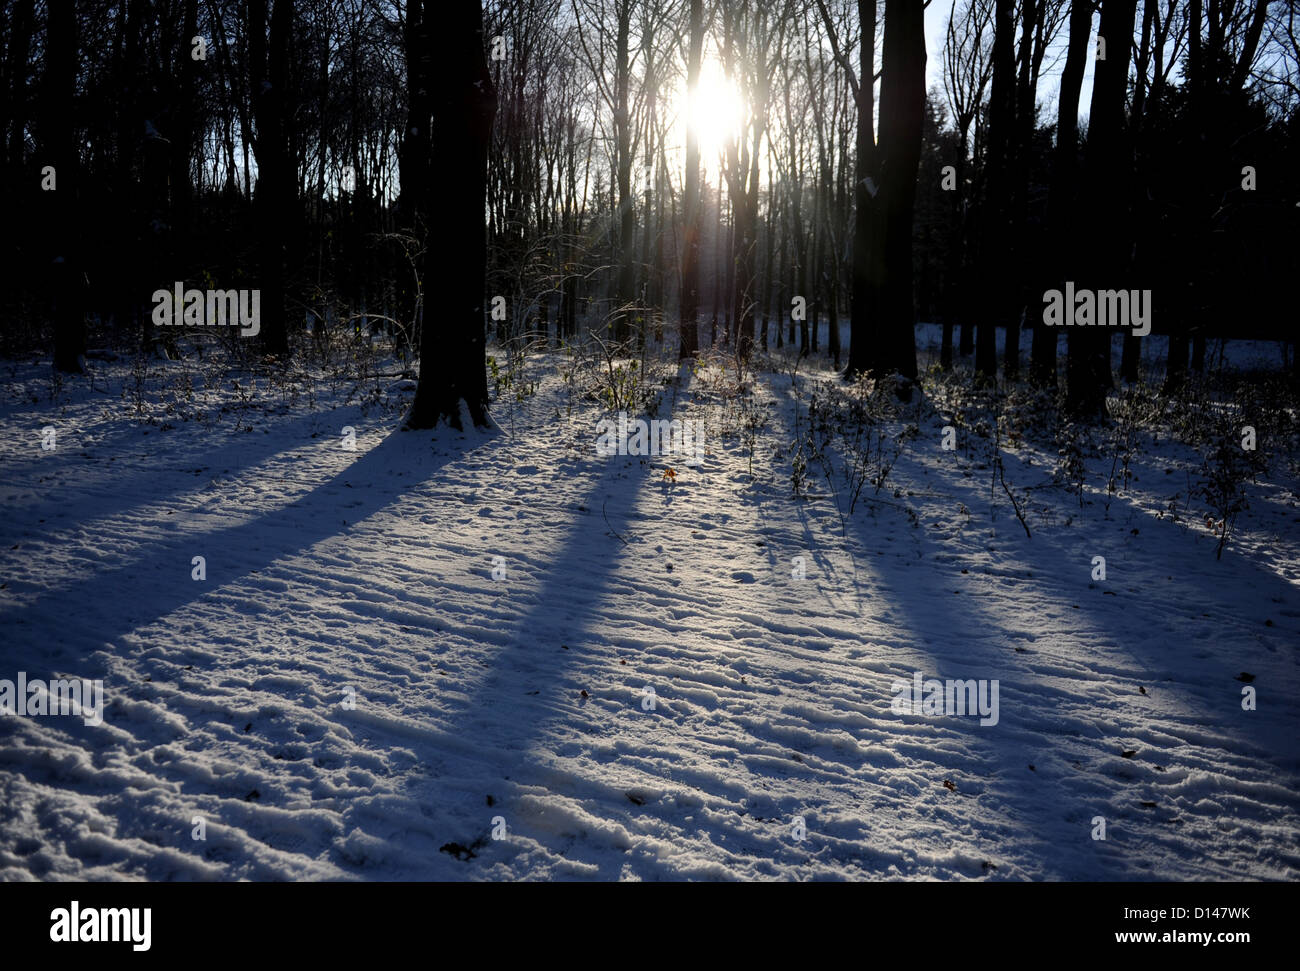 The sun iluminates the snow at Volkspark in Hamburg, Germany, 06 December 2012. Photo: Angelika Warmuth - Stock Image